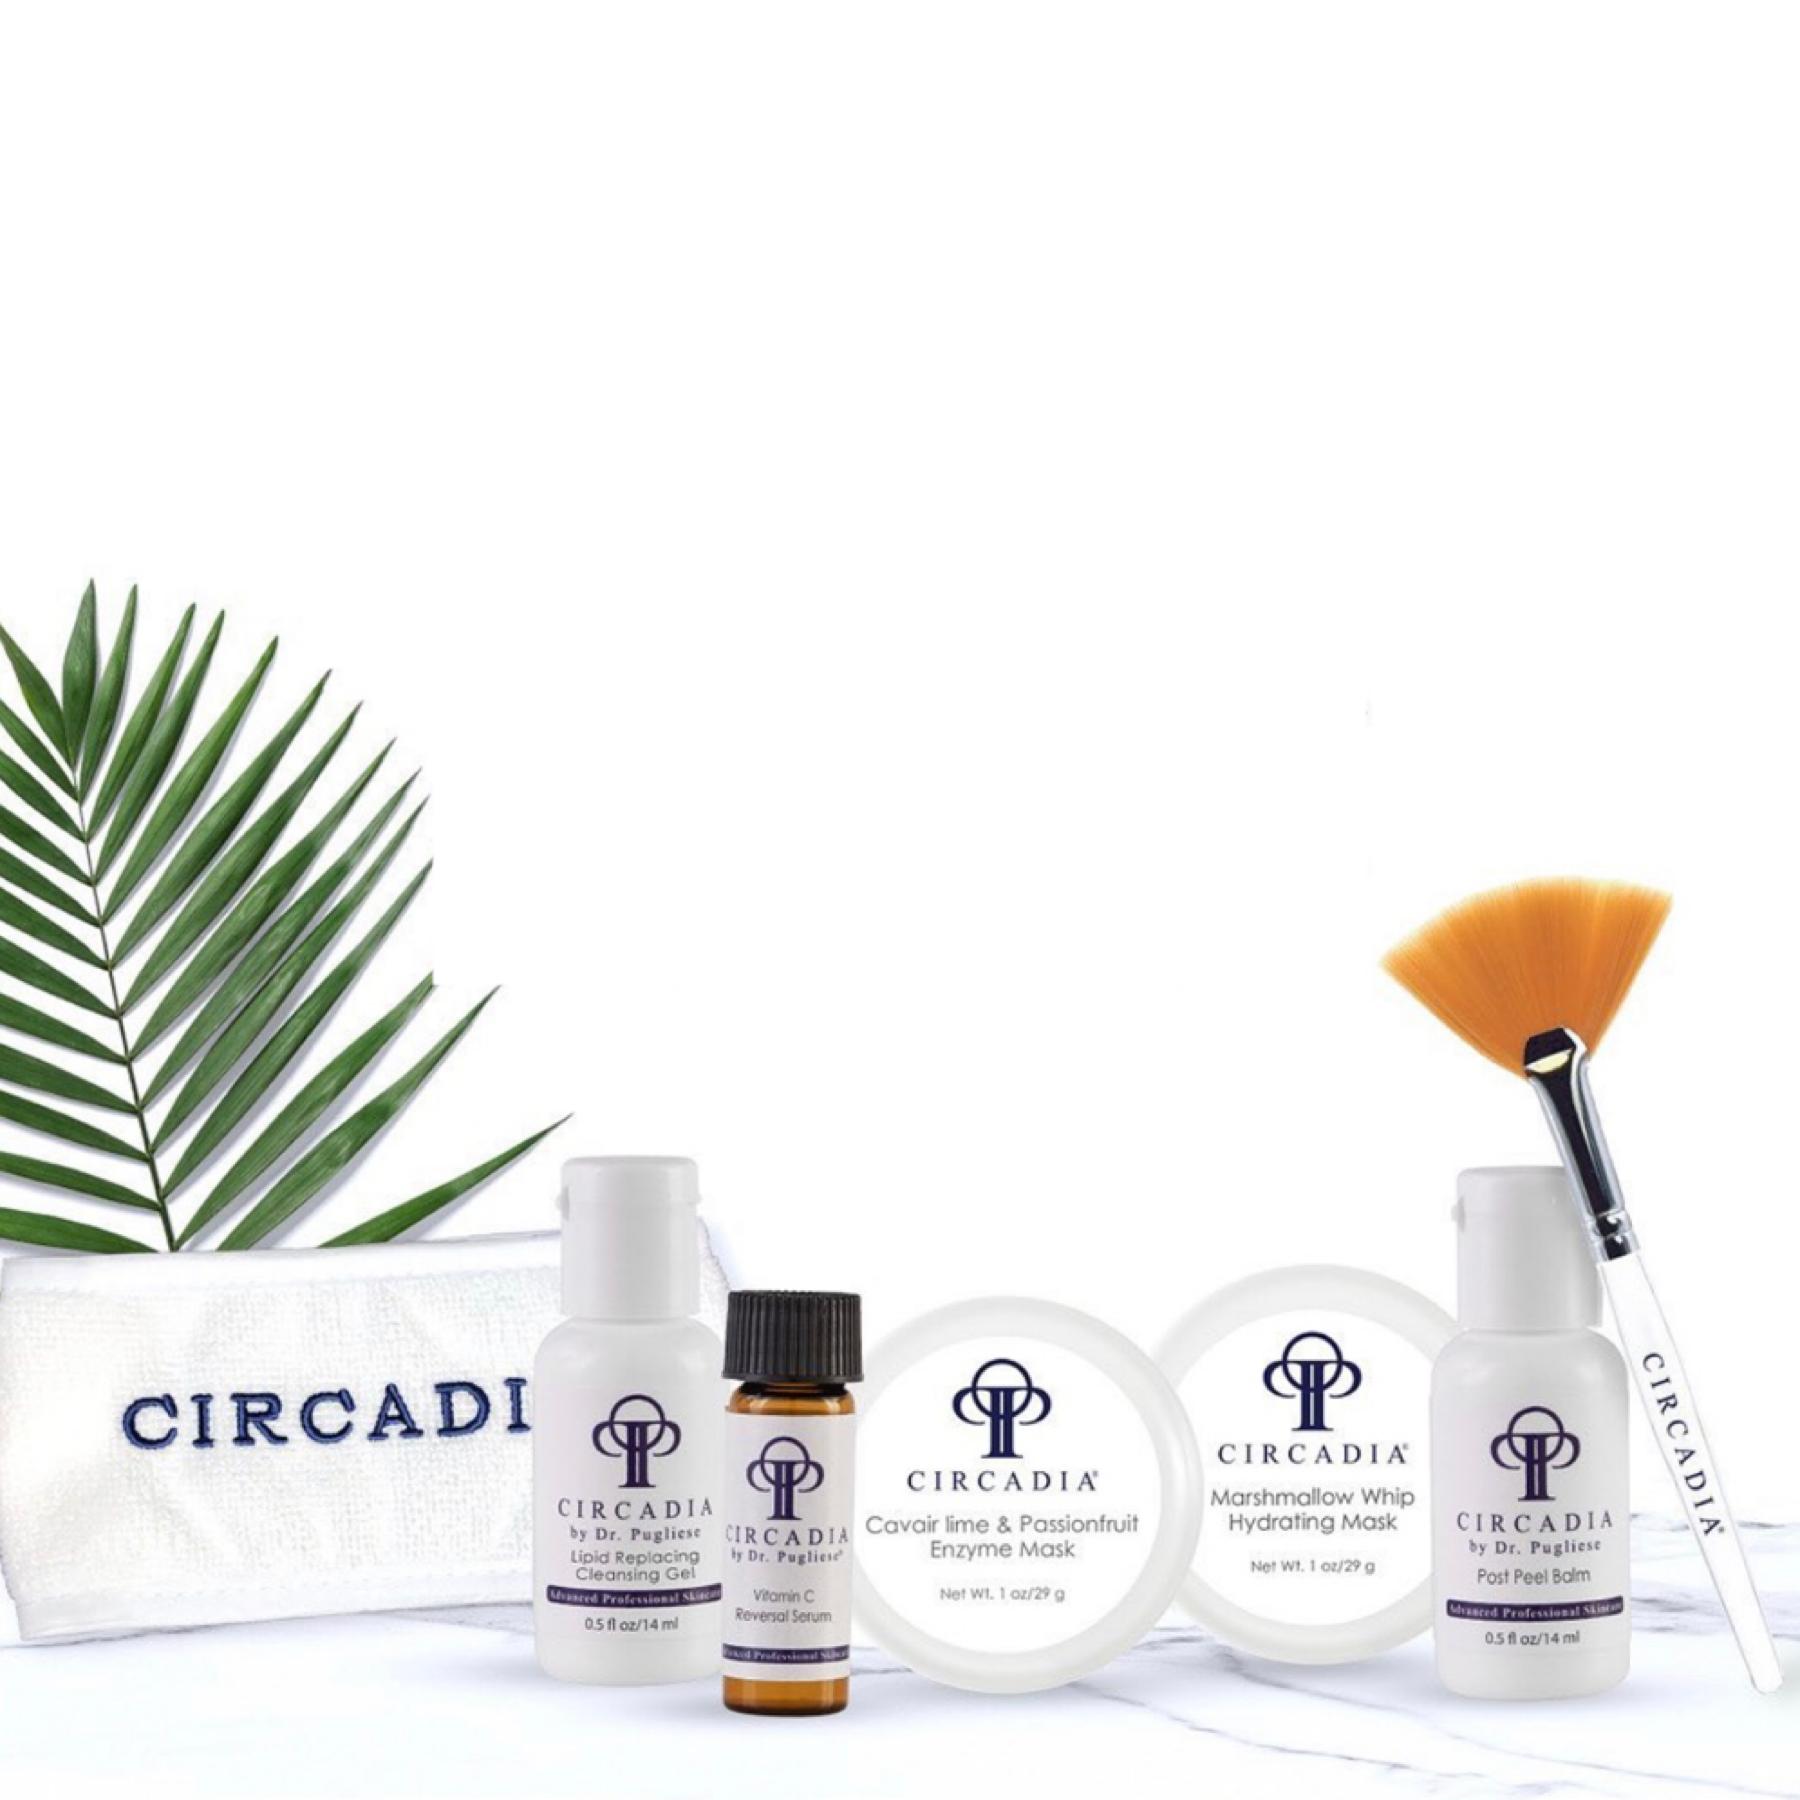 Circadia Staycation kit